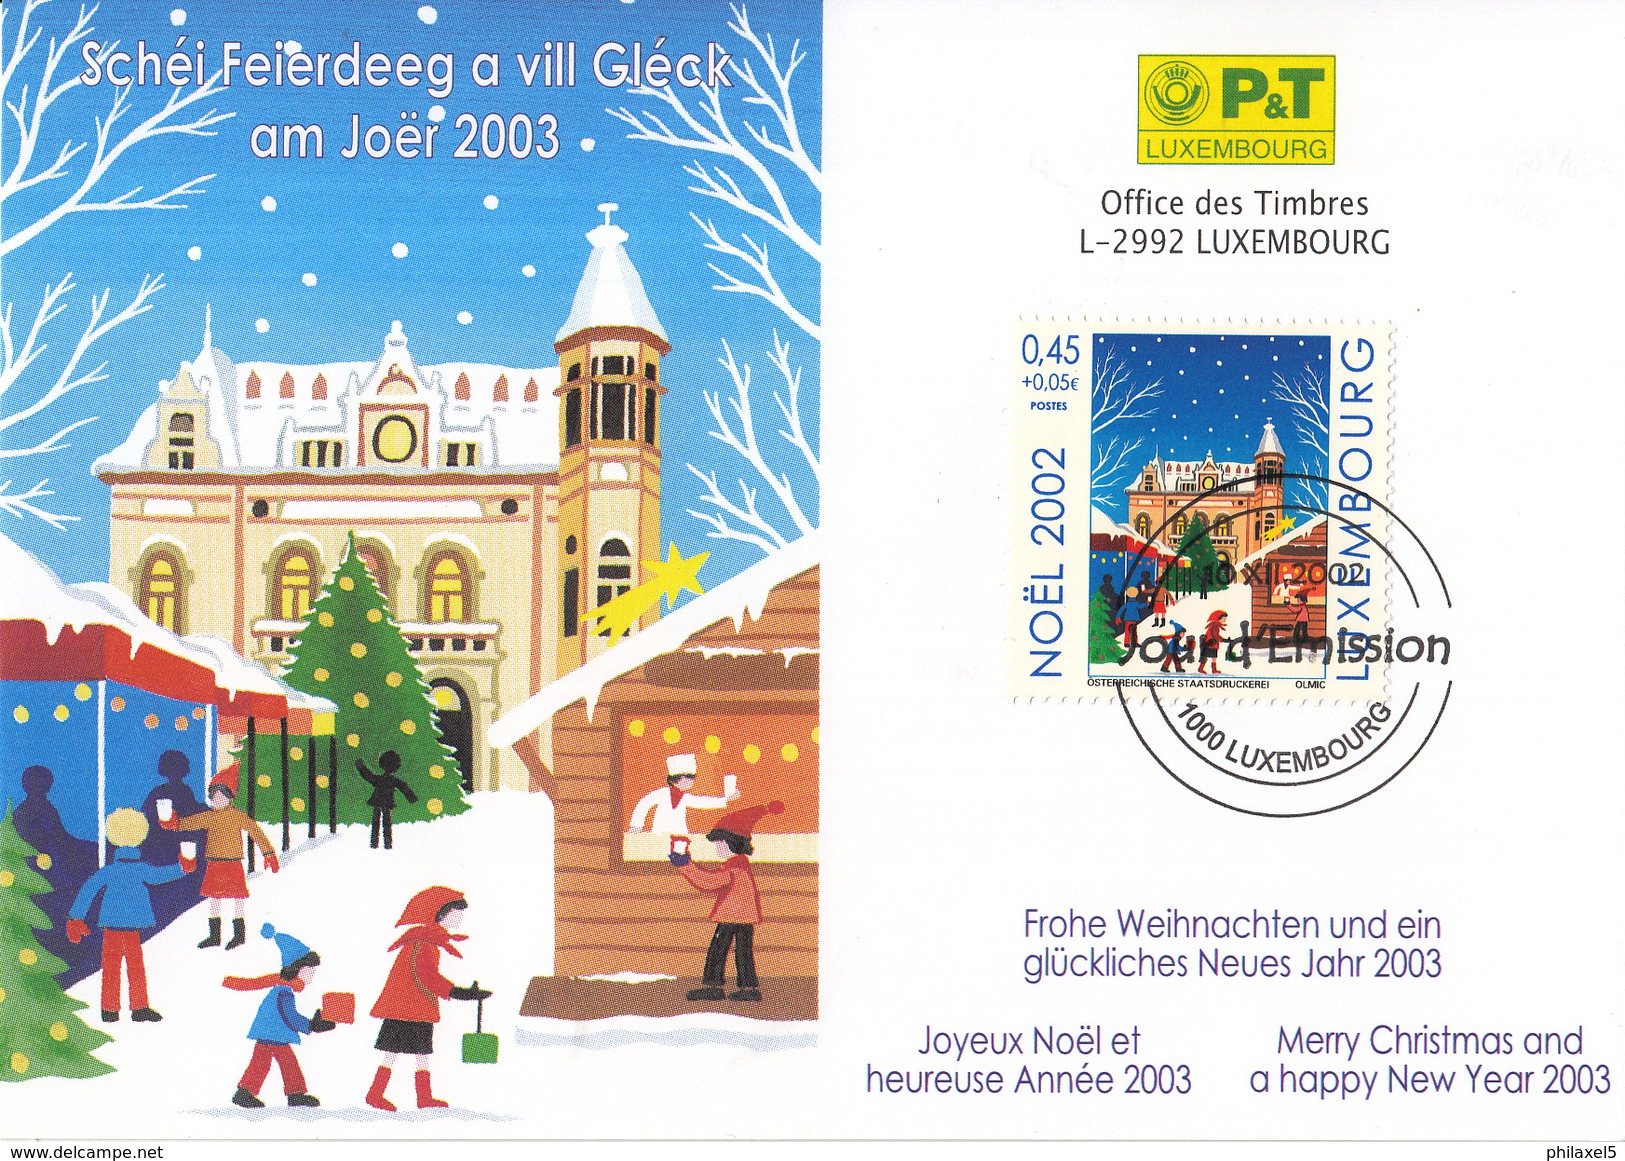 Luxemburg - FD Kaart - 10 December 2002 - Kerstmis/Weihnachten/Christmas - M 1592 - Marcofilie - EMA (Print Machine)